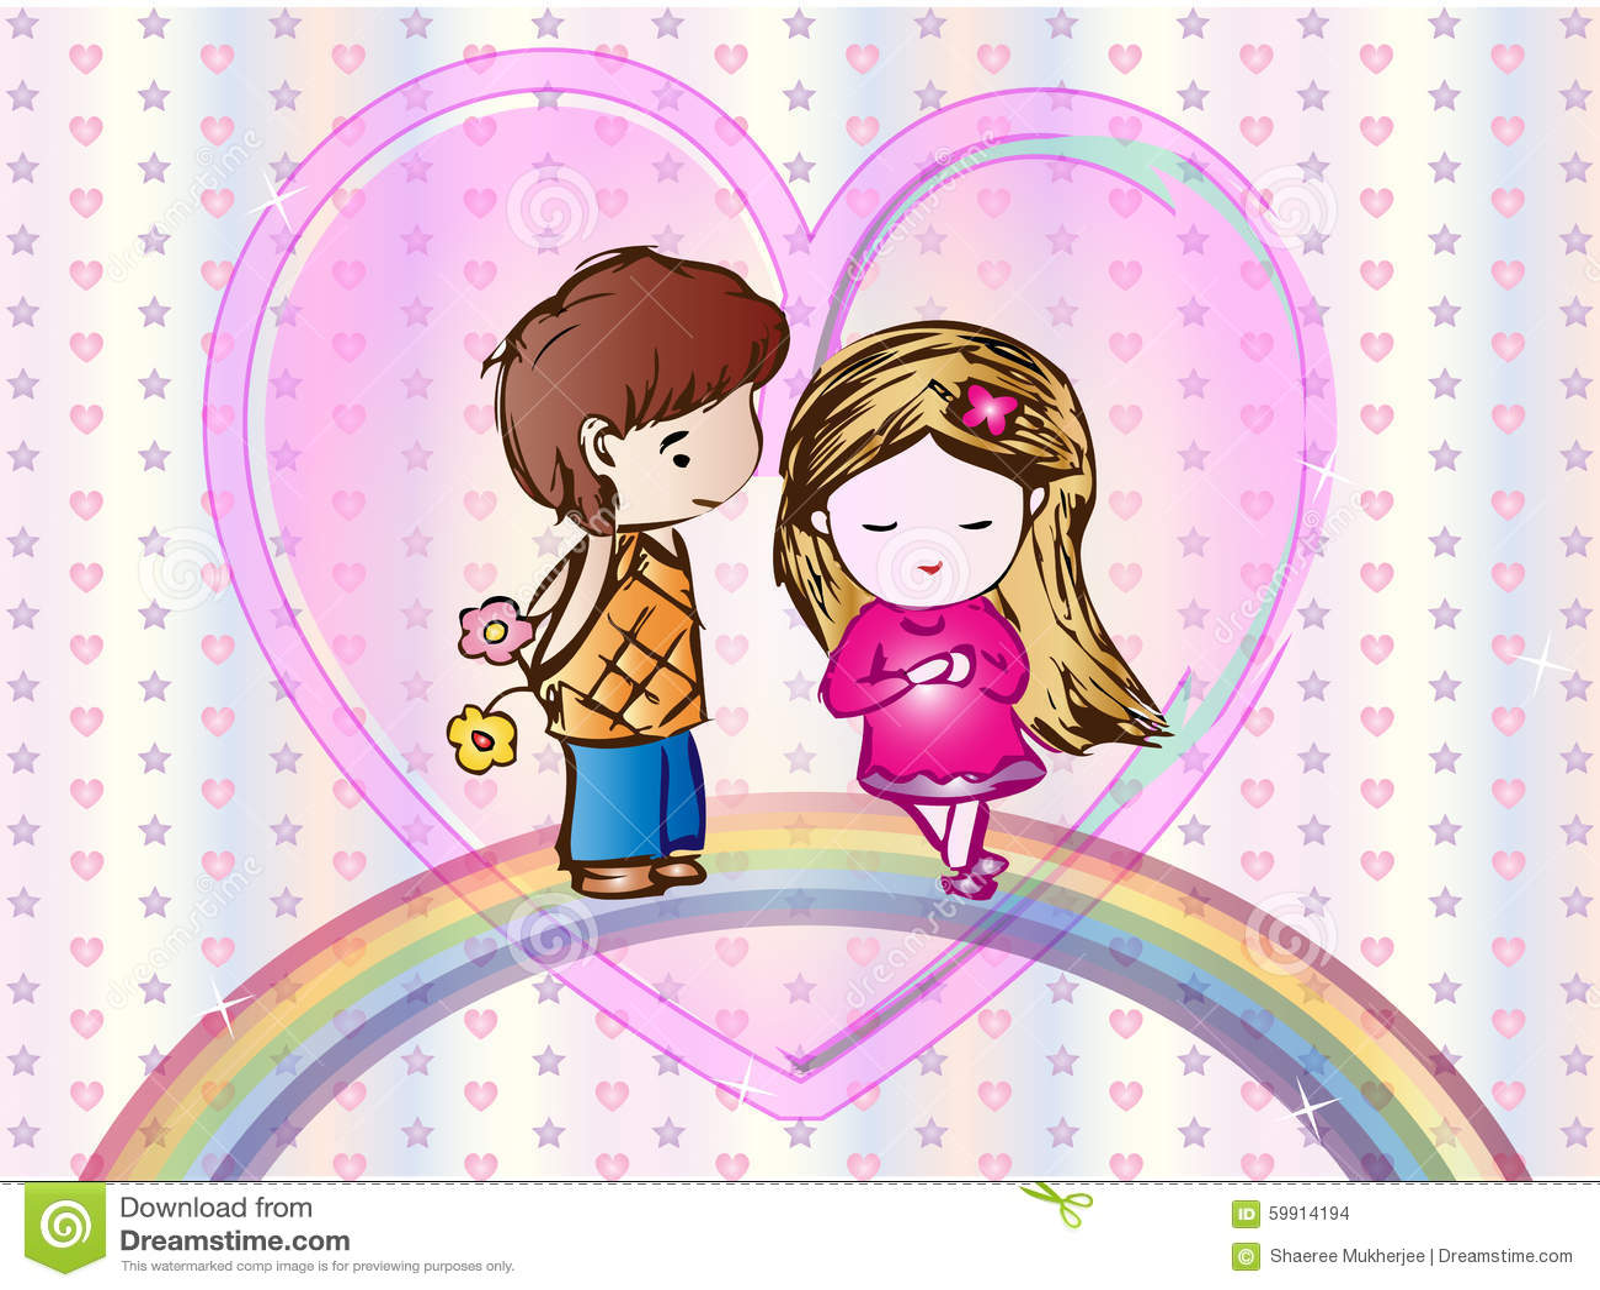 Cartoon Wallpaper Girl Boy This Wallpapers